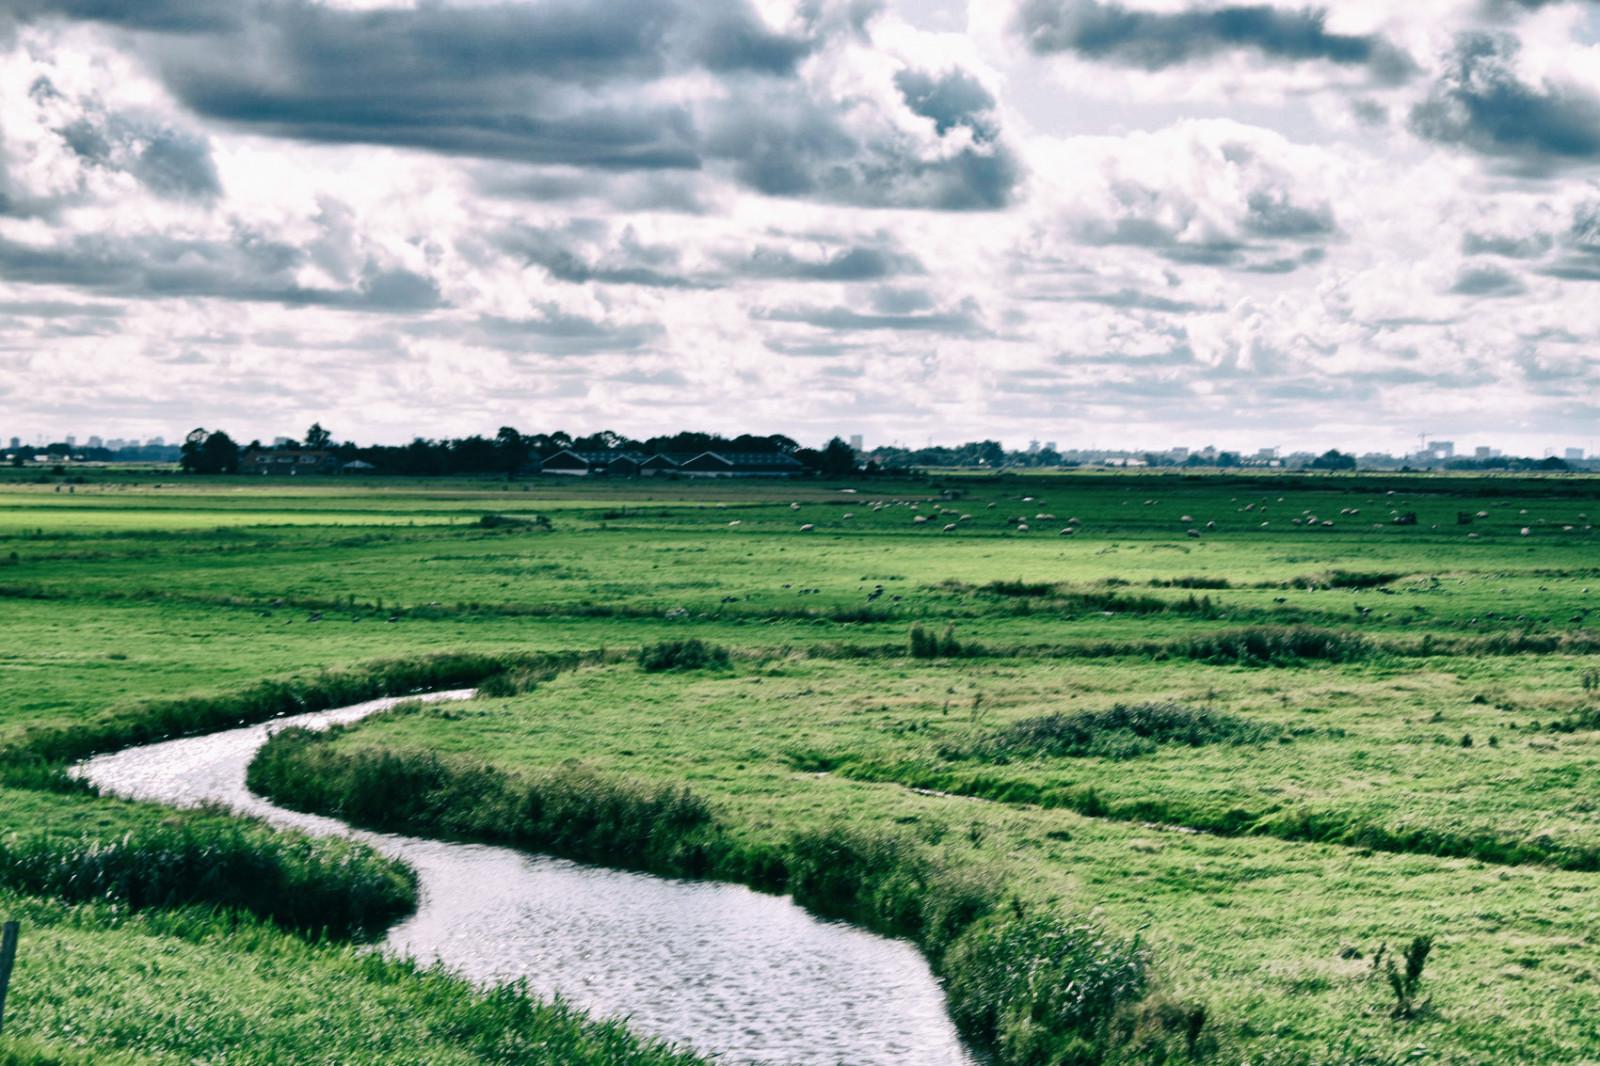 sky-above-polder-landscape